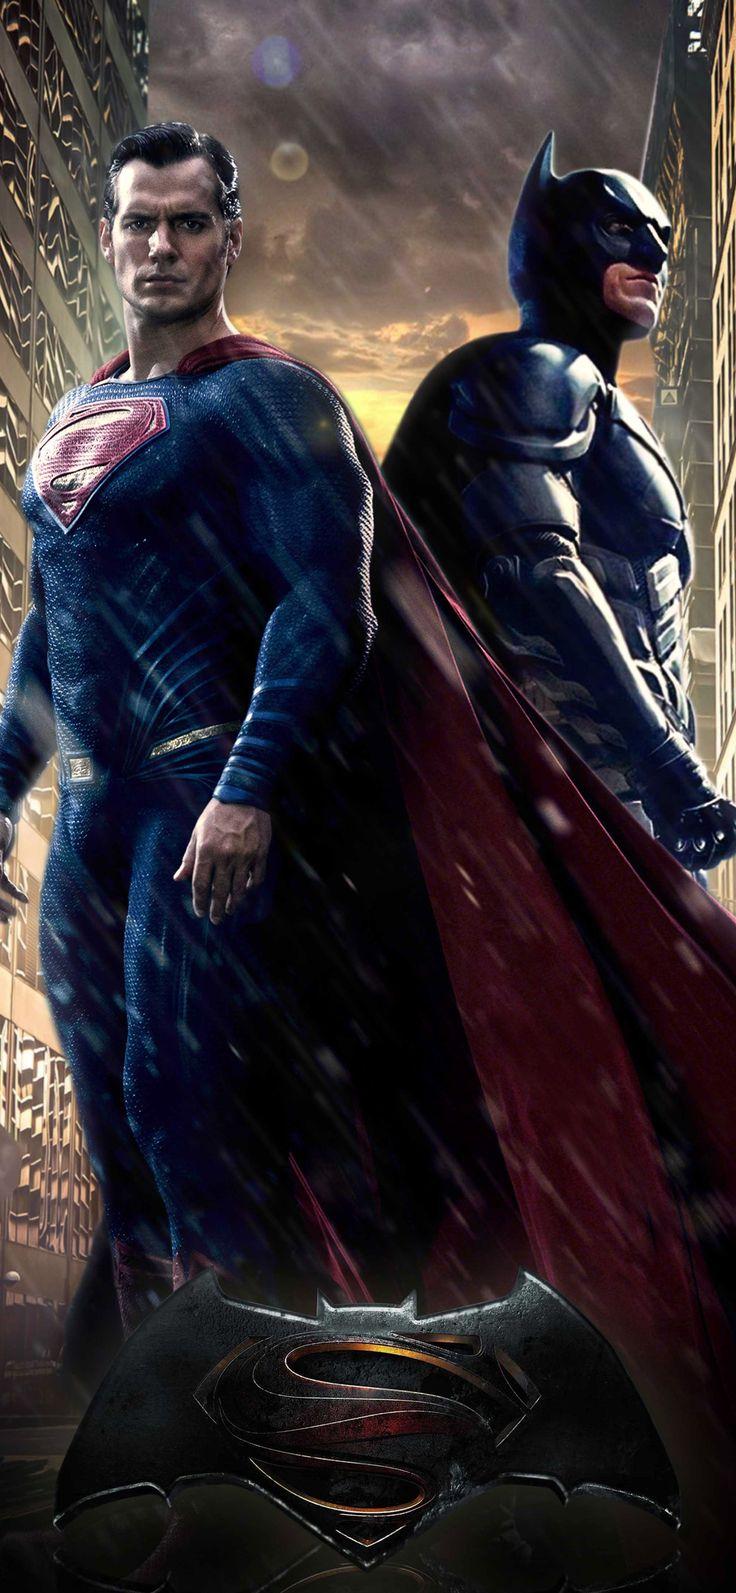 1125x2436 Batman Superman Henry Cavill Iphone XS,Iphone 10